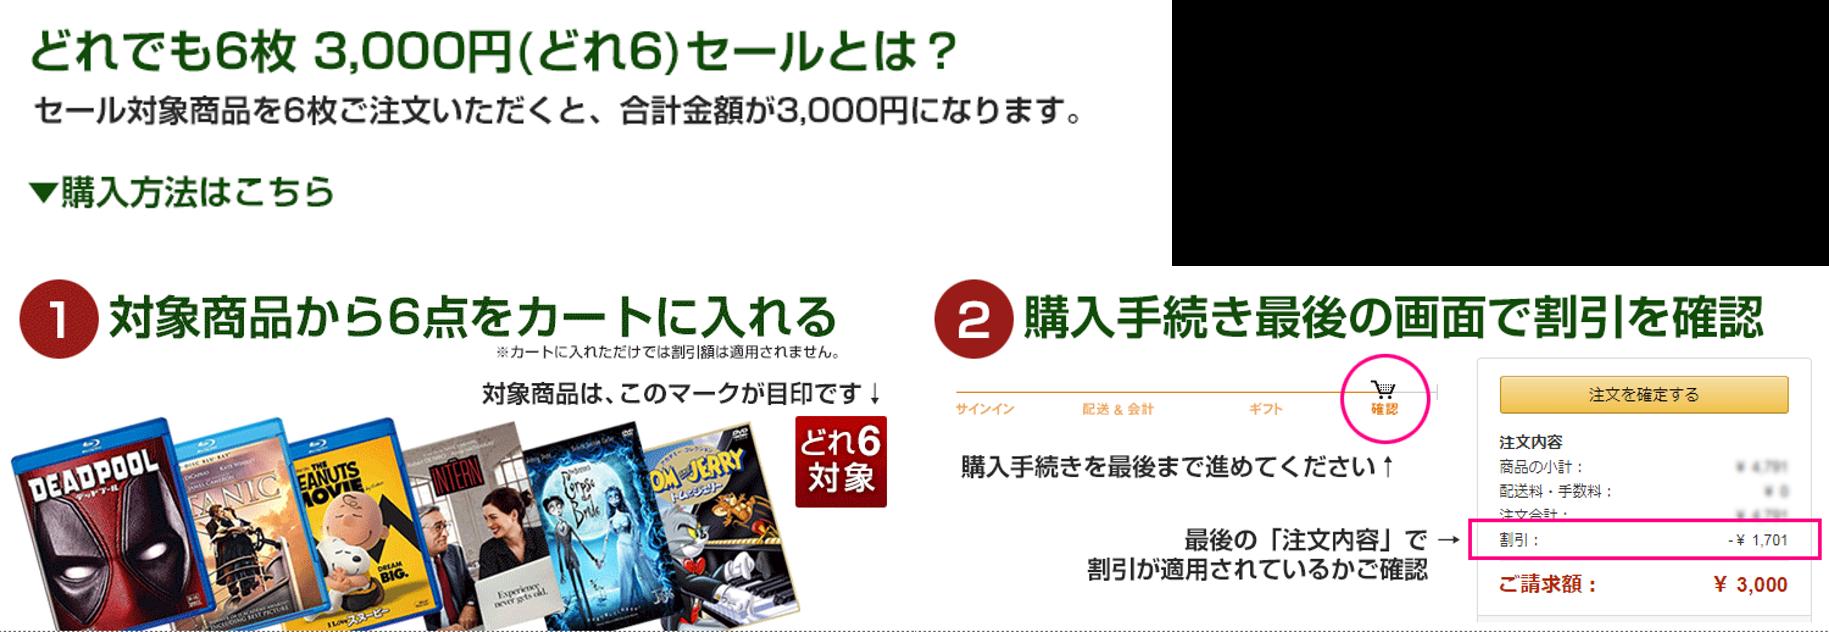 Amazonサイバーマンデー特別企画 どれ6 steelbook